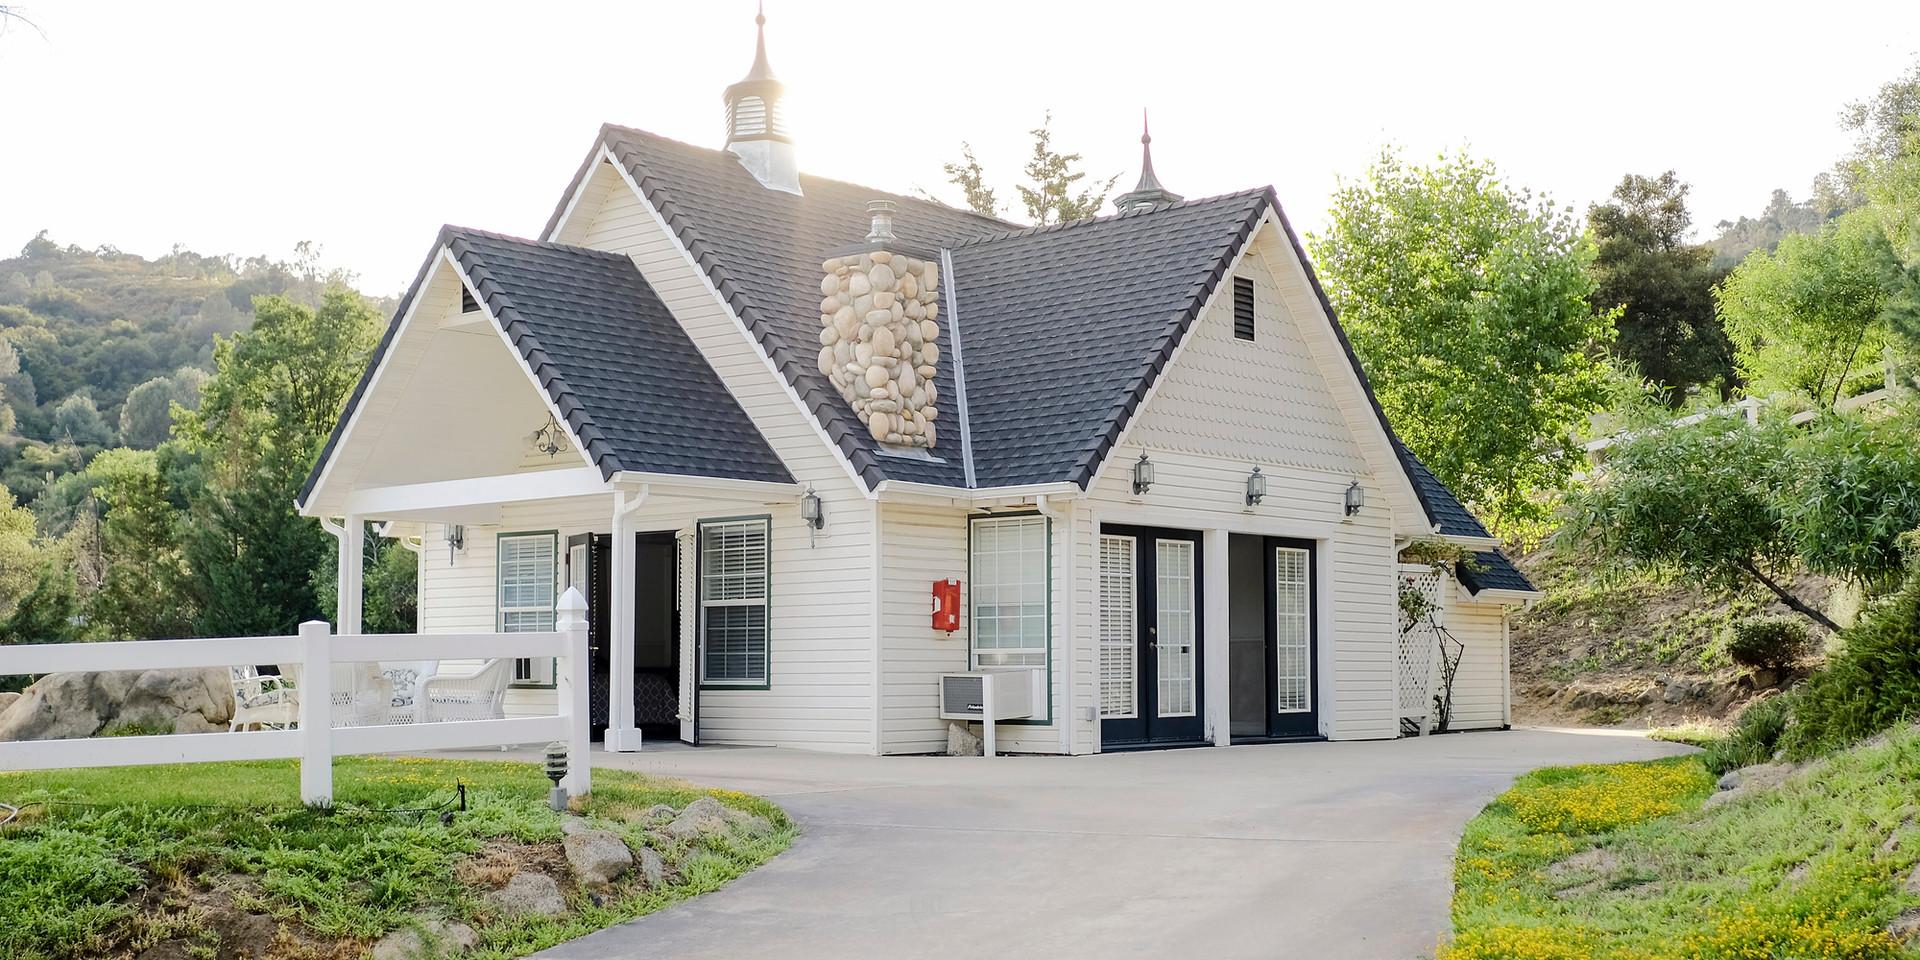 SUMMER HOUSE COTTAGE